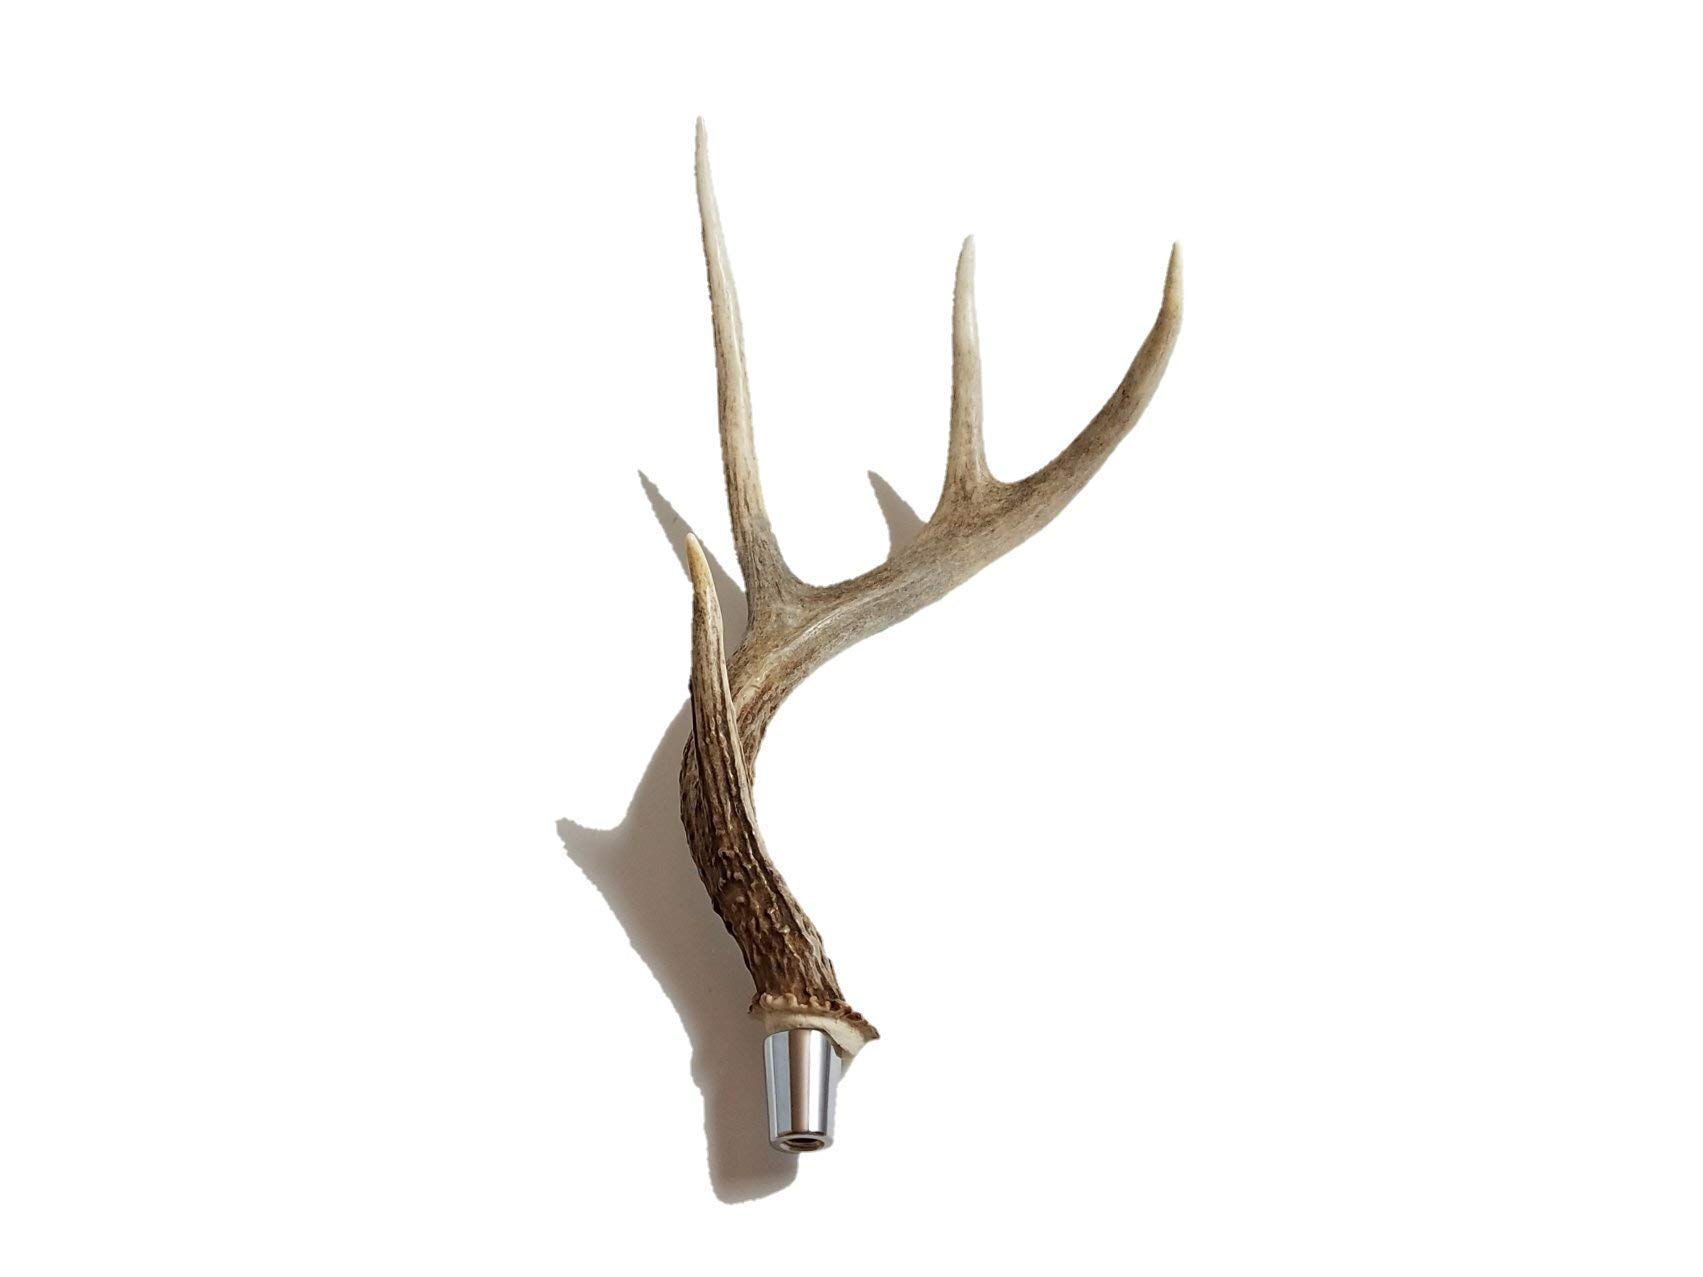 Real Whitetail Deer Antler Beer Tap Handle for Kegerators Keezers Keg Bar Man Cave